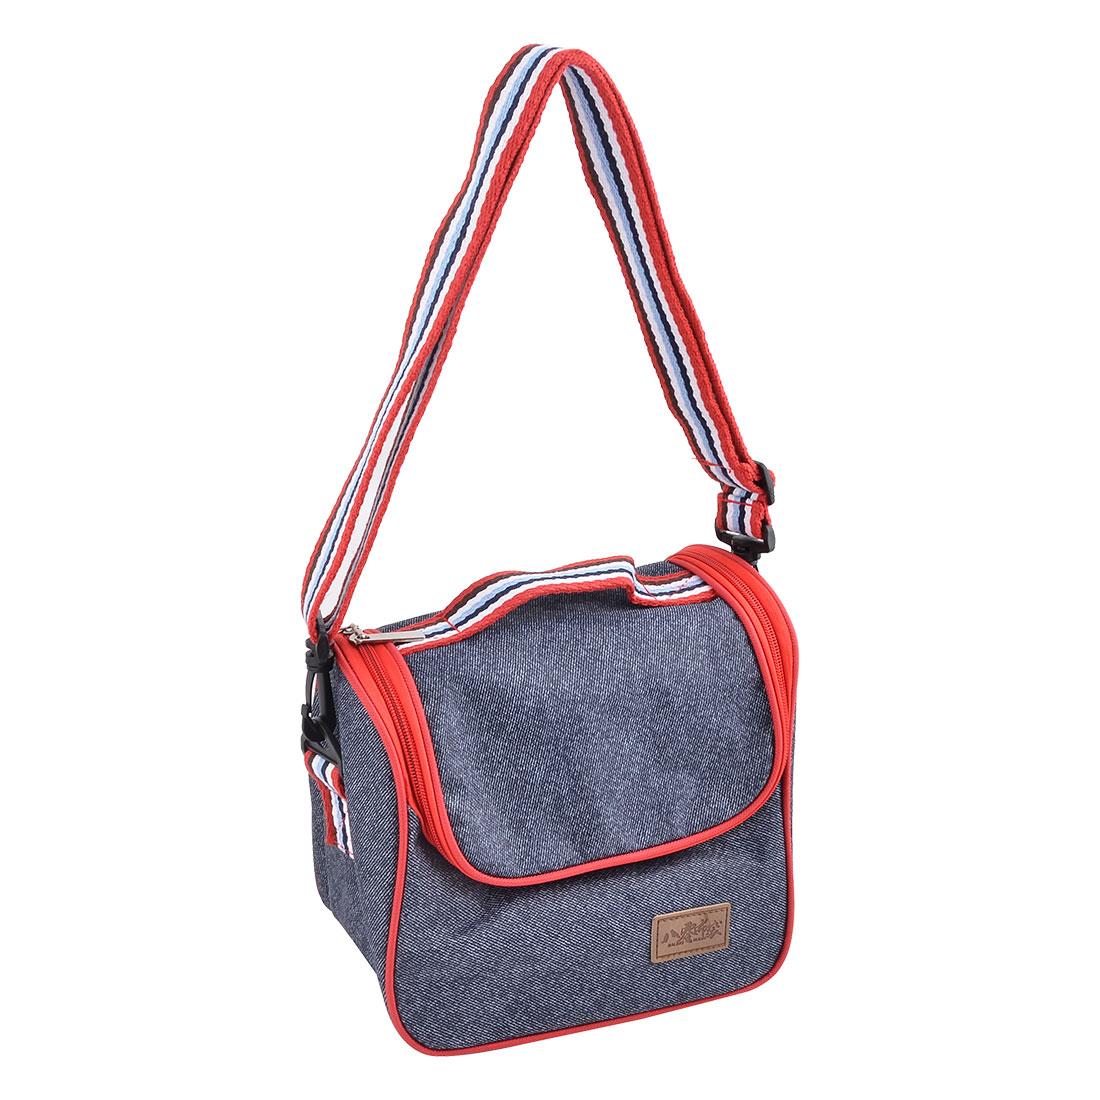 Hiking Oxford Fabric Zipper Closure Food Warming Cooler Storage Bag Dark Blue